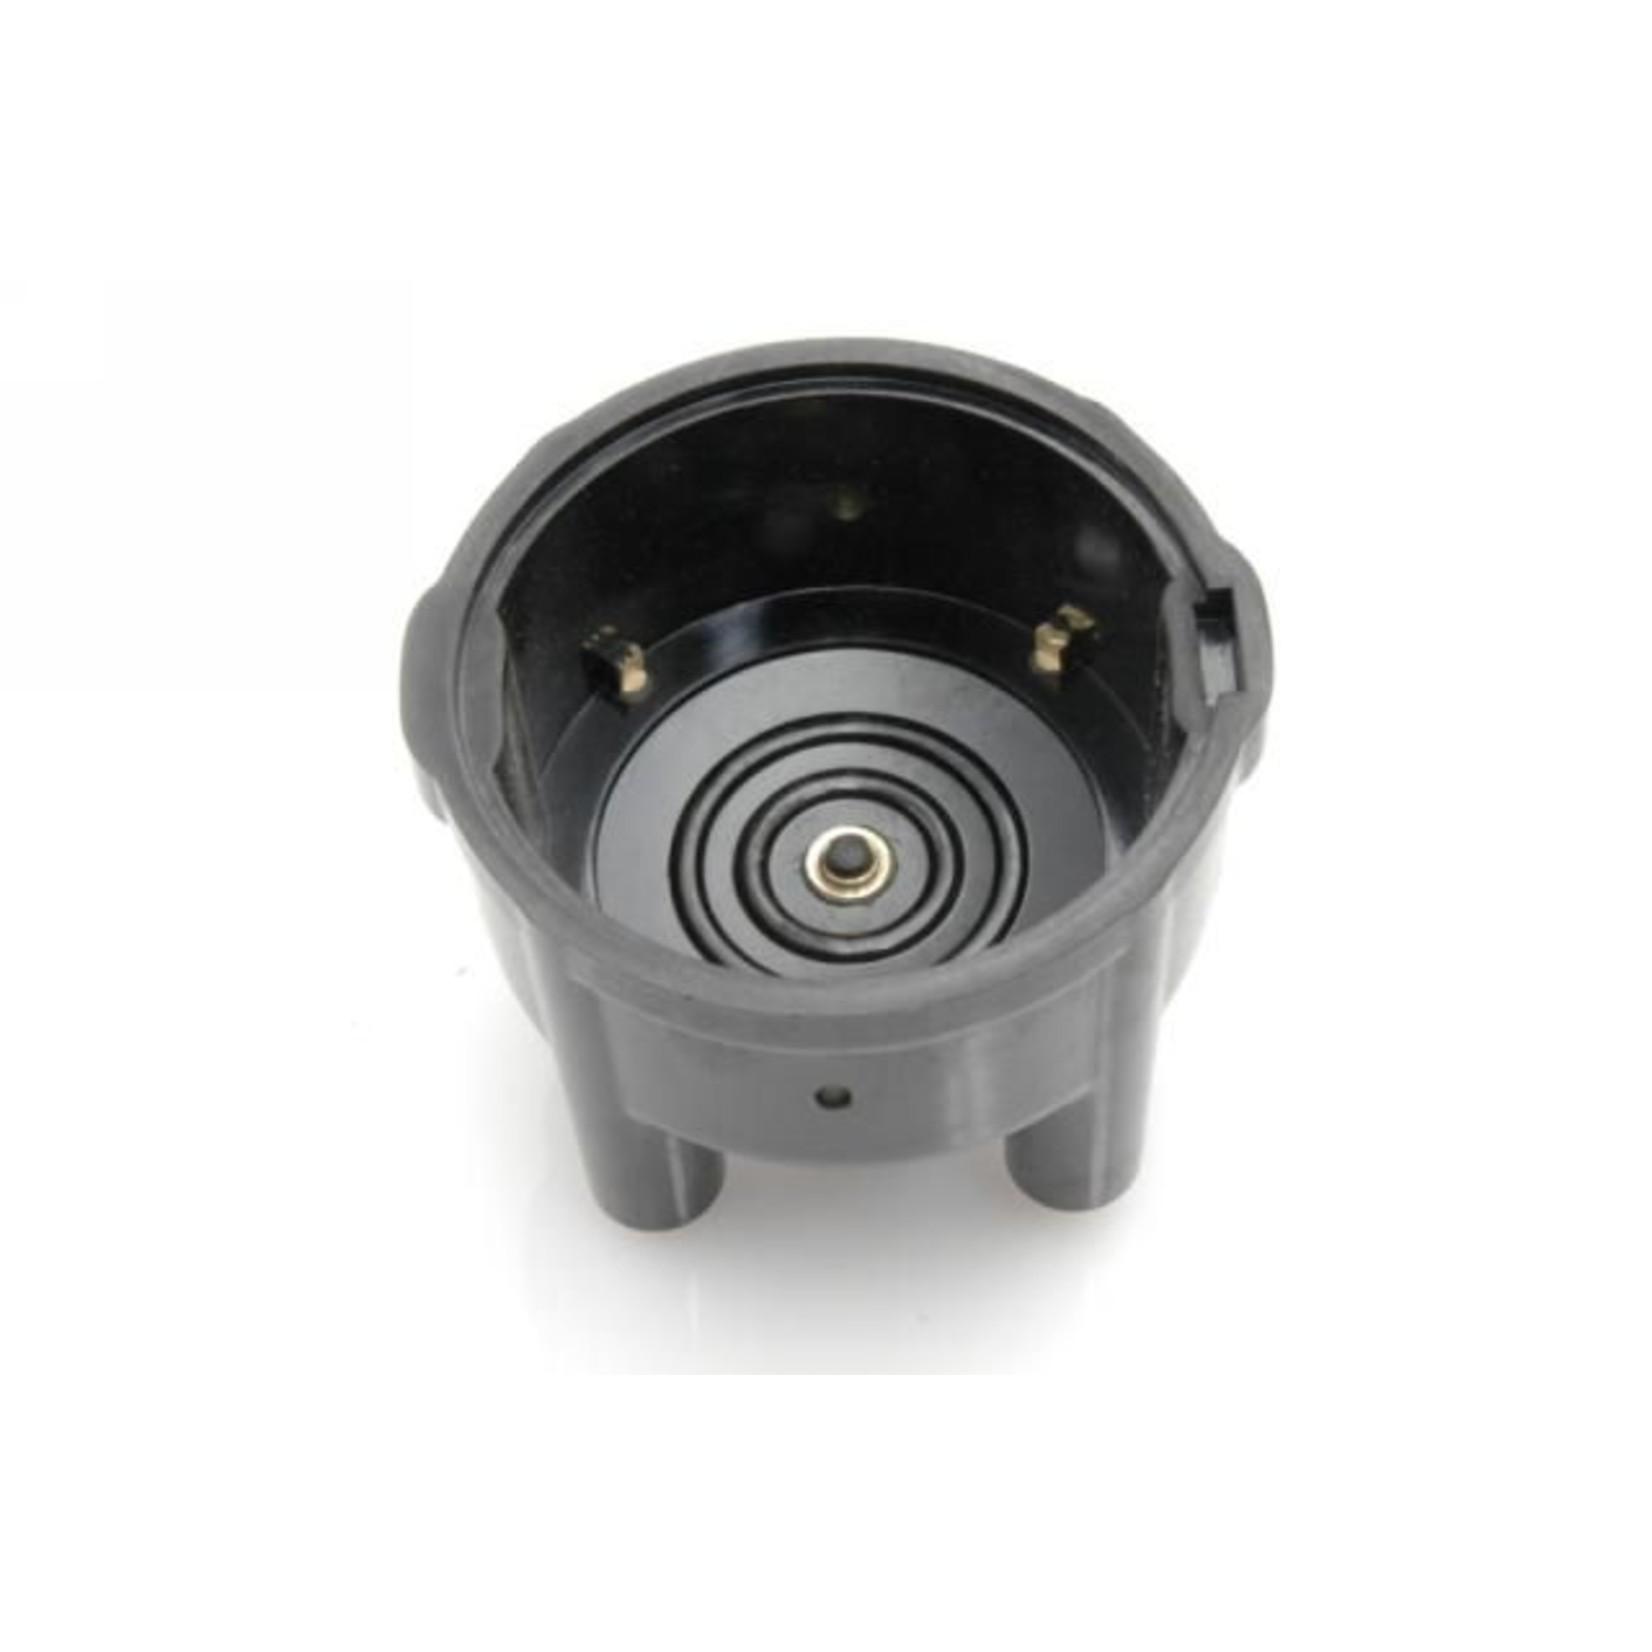 Distributor head SEV Nr Org: DM21115A